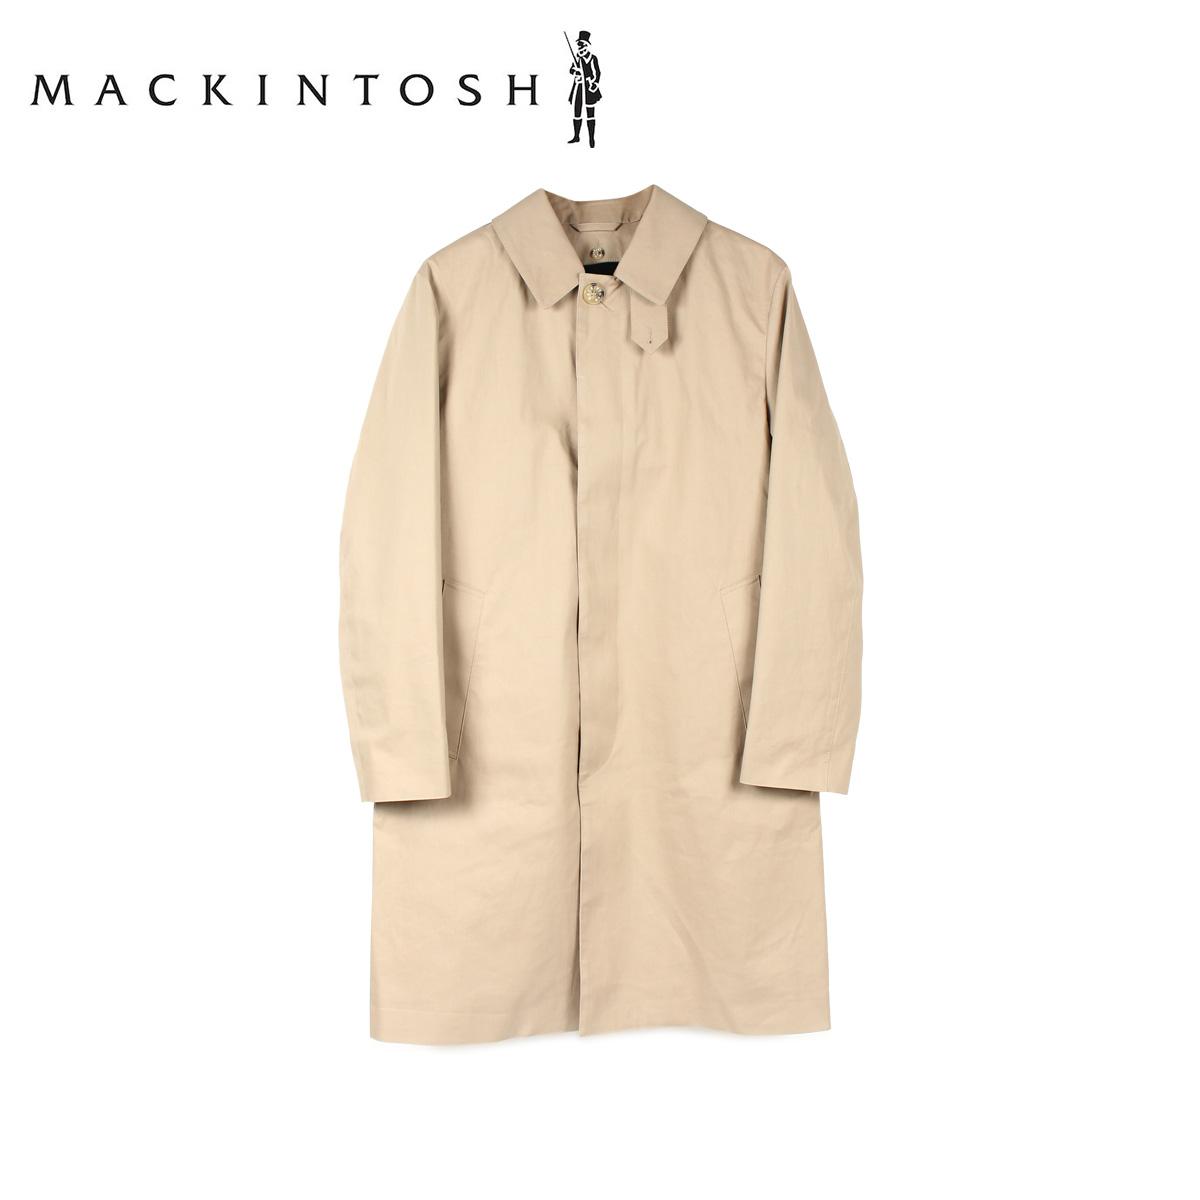 Mackintosh マッキントッシュ ダンケルド コート ステンカラー メンズ DUNKELD ベージュ GM-1001FD